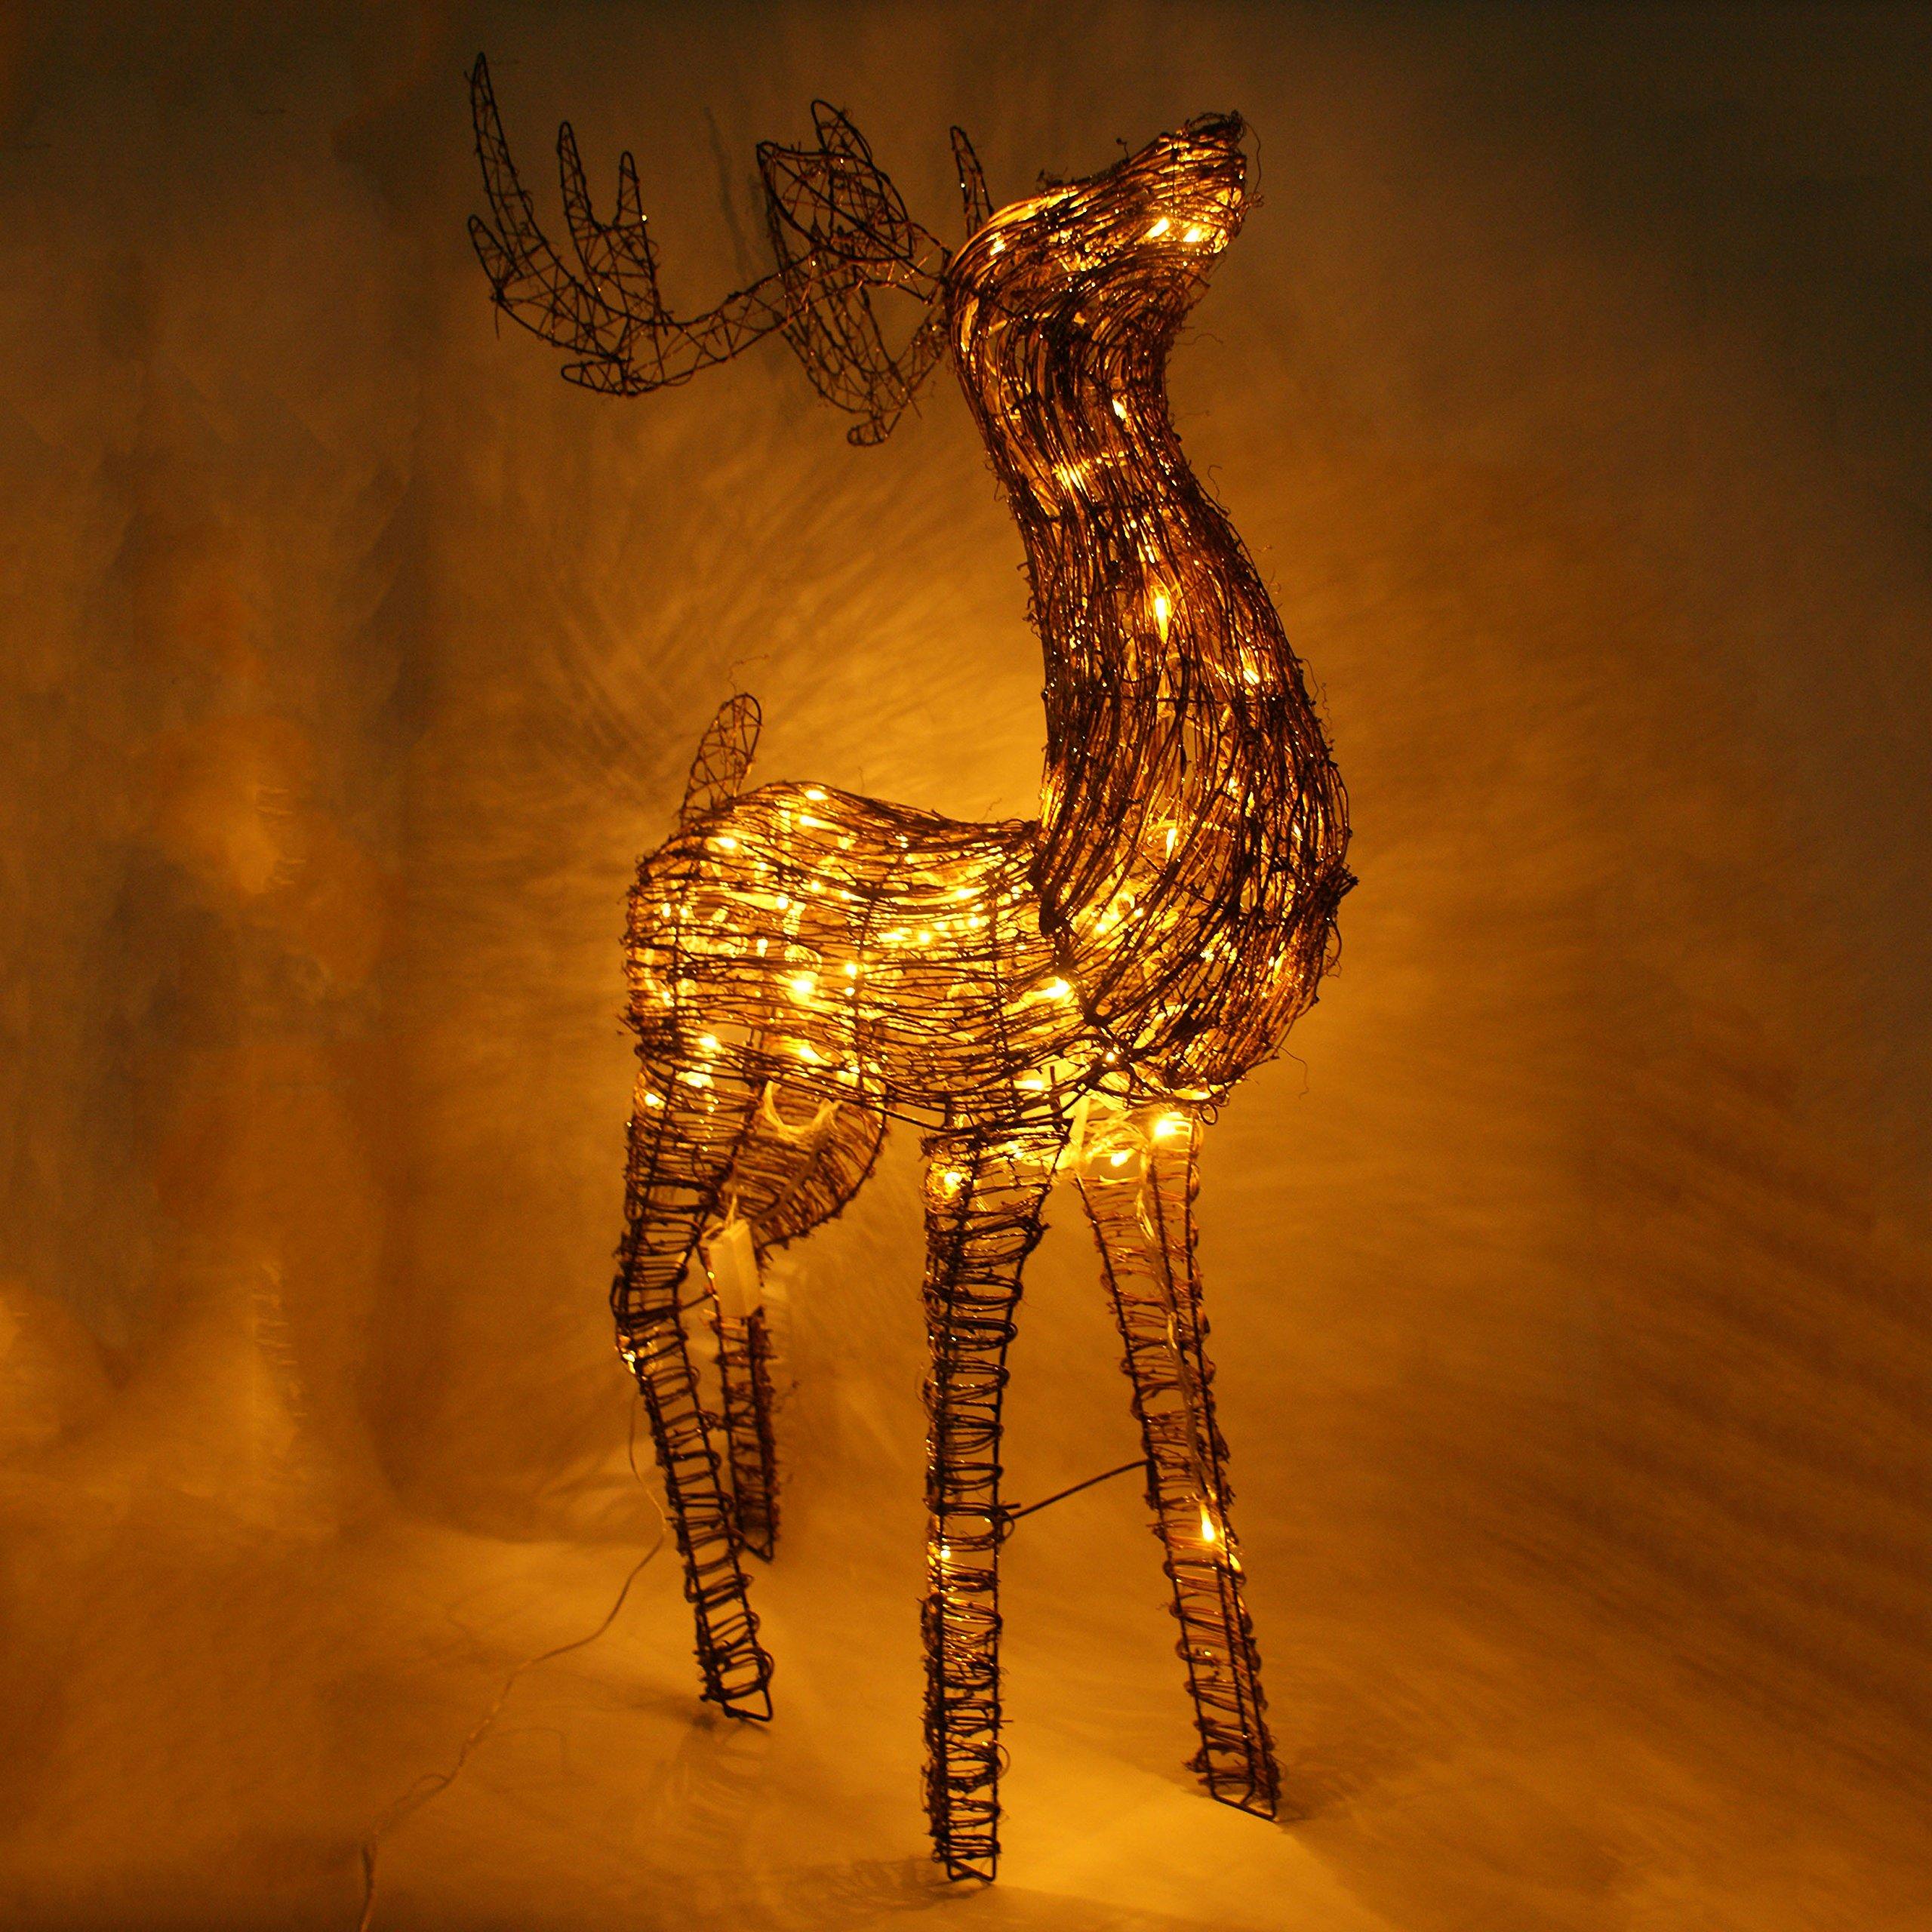 45'' Led lighted Glittering Standing Buck Reindeer Lighted Christmas Yard Art Decoration - Clear Lights